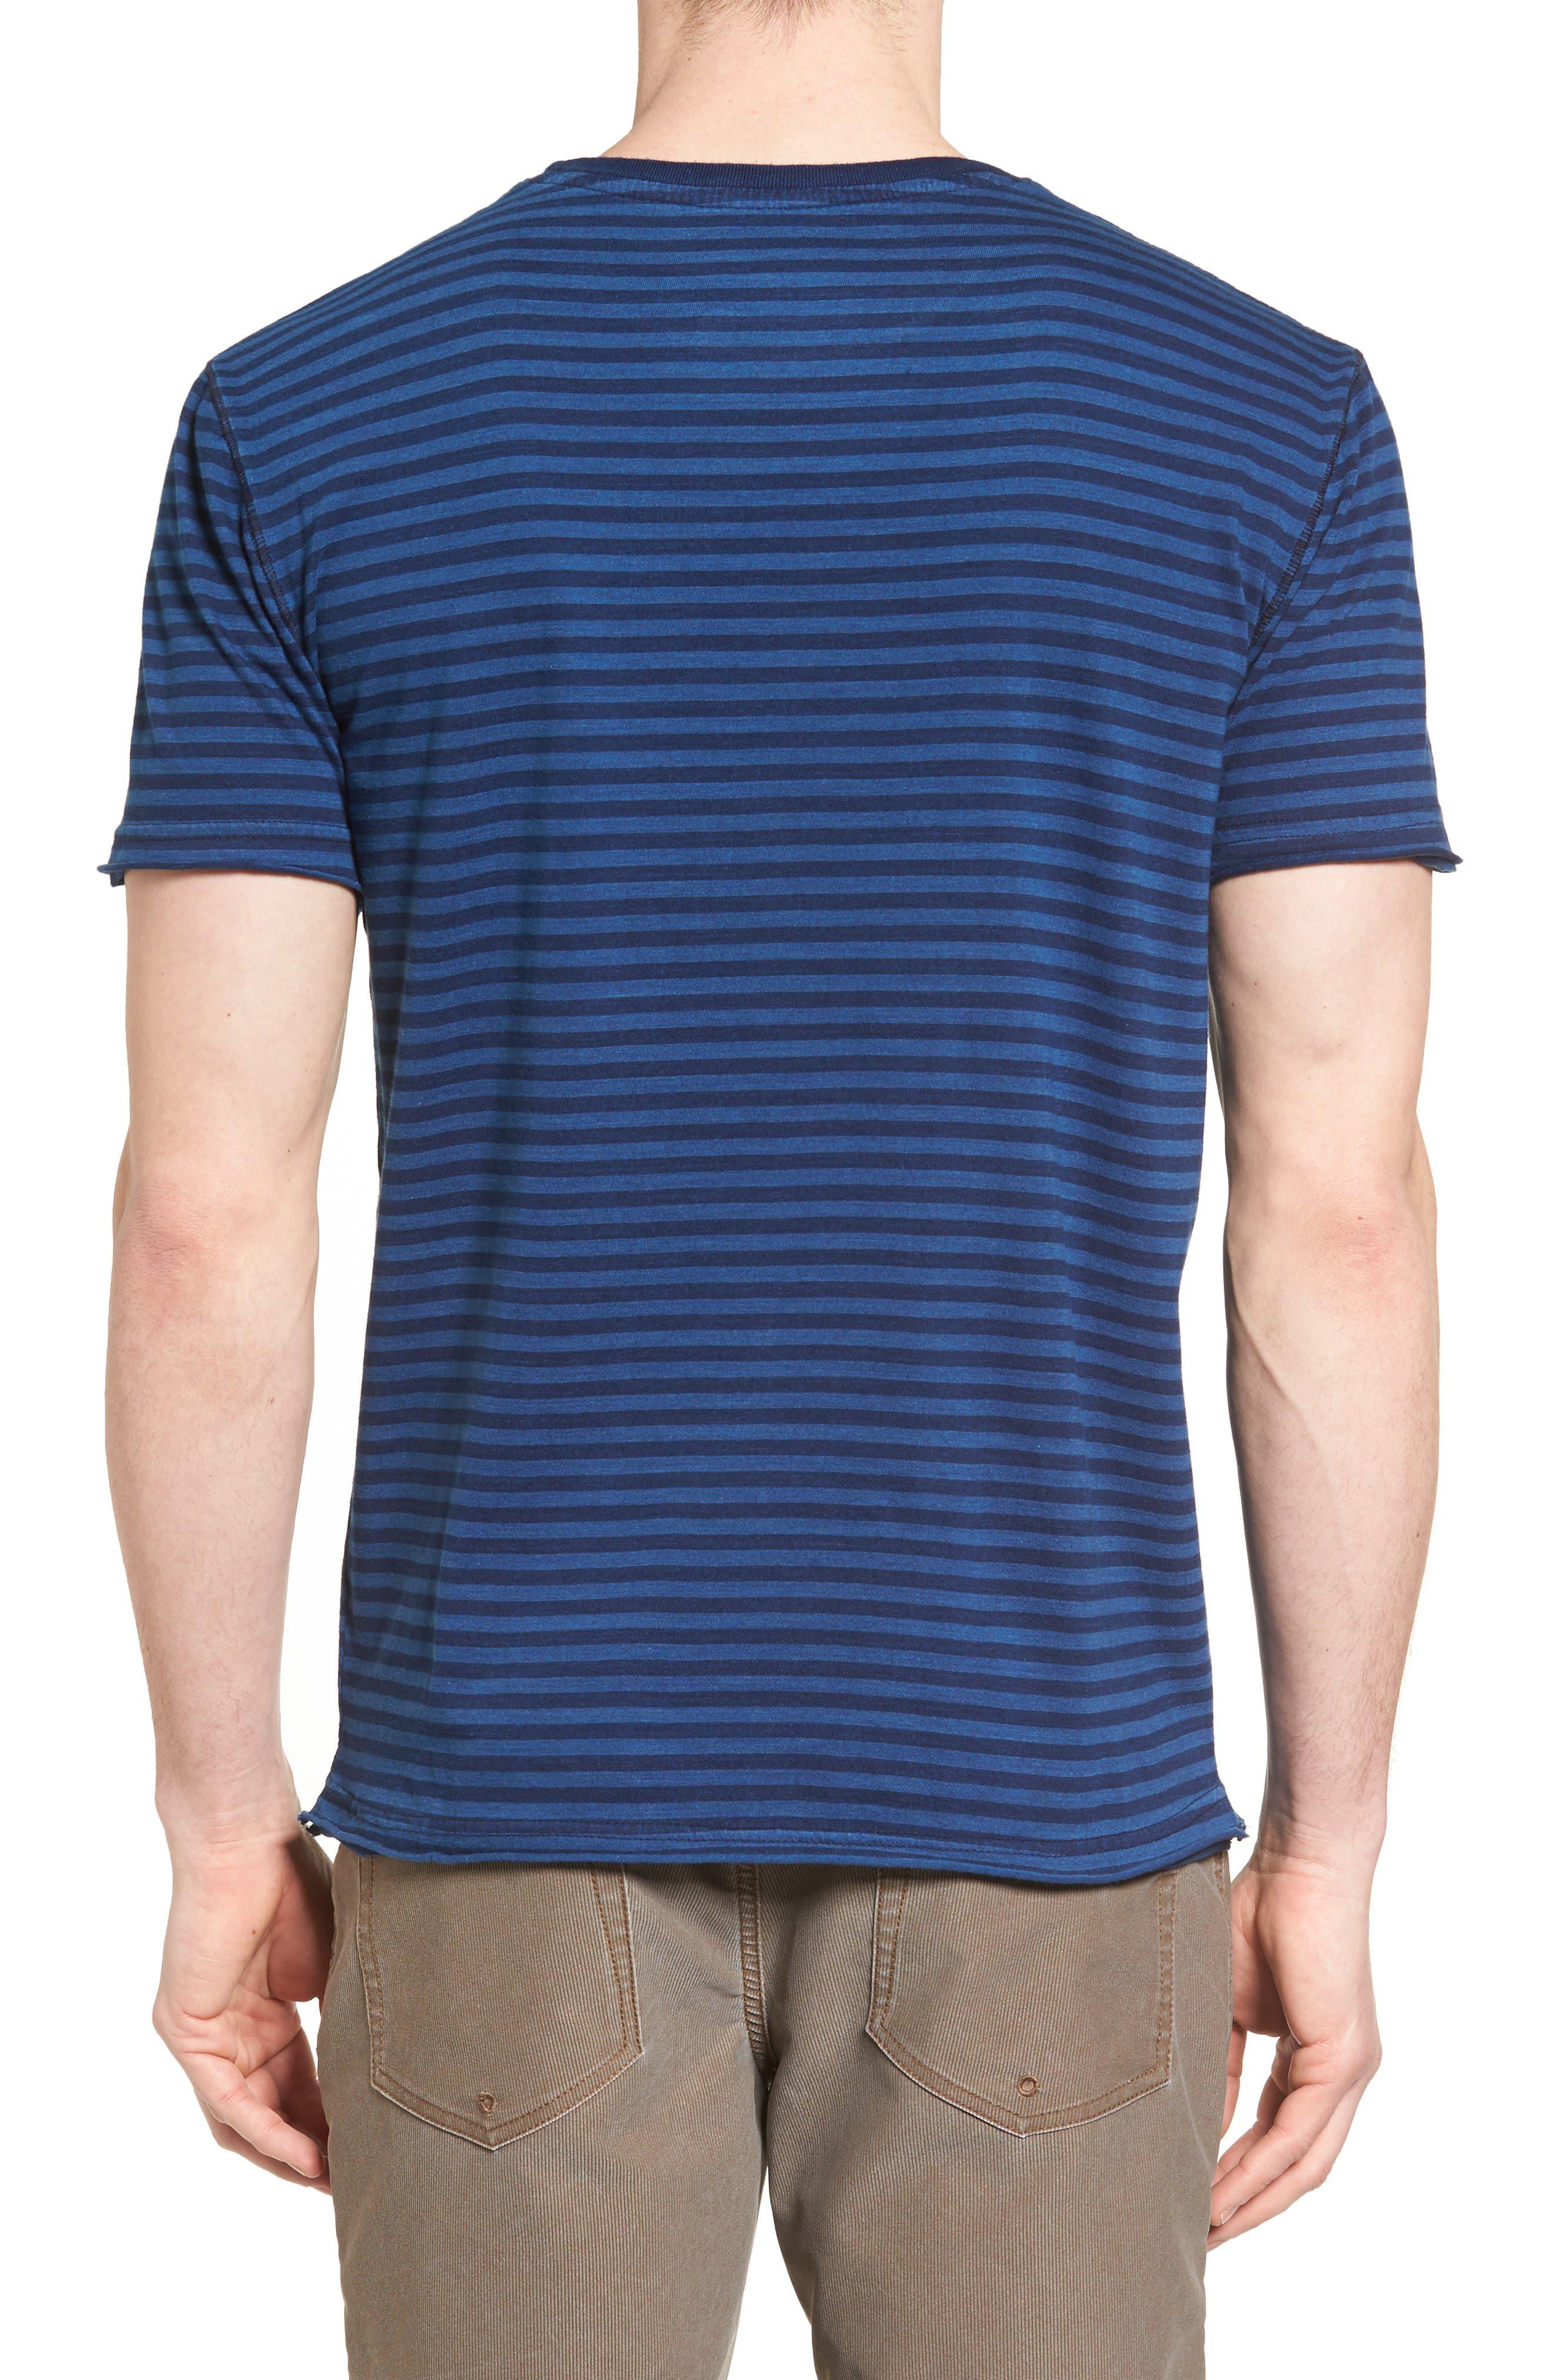 Take It Slow T-Shirt,                             Alternate thumbnail 2, color,                             441